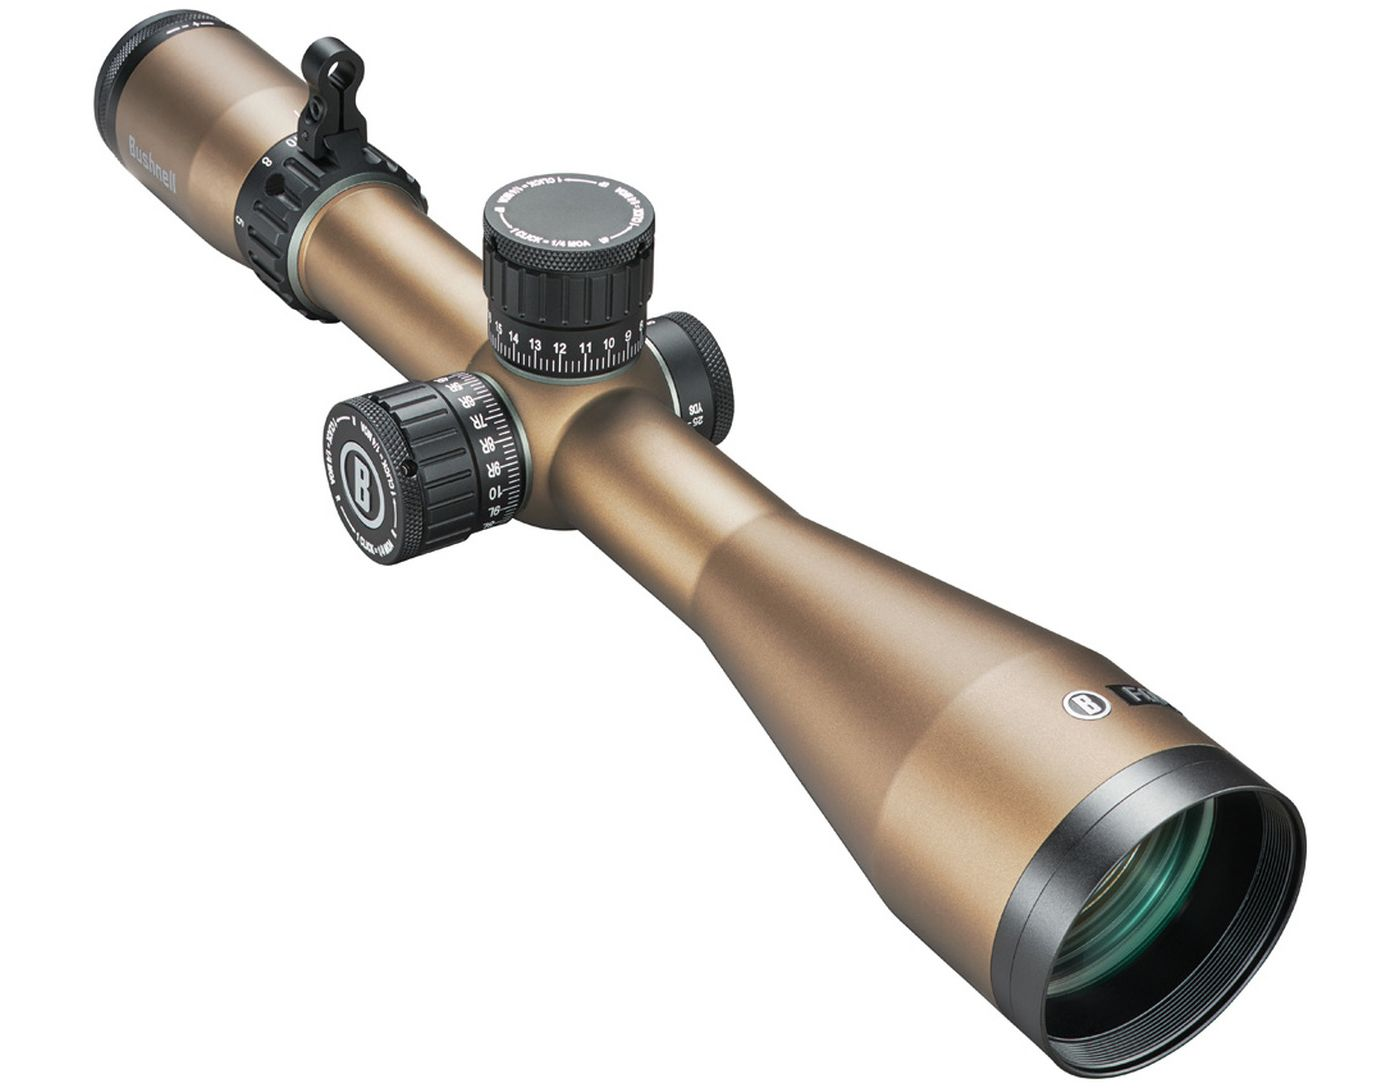 Bushnell Forge 3-18x50 FFP Rifle Scope